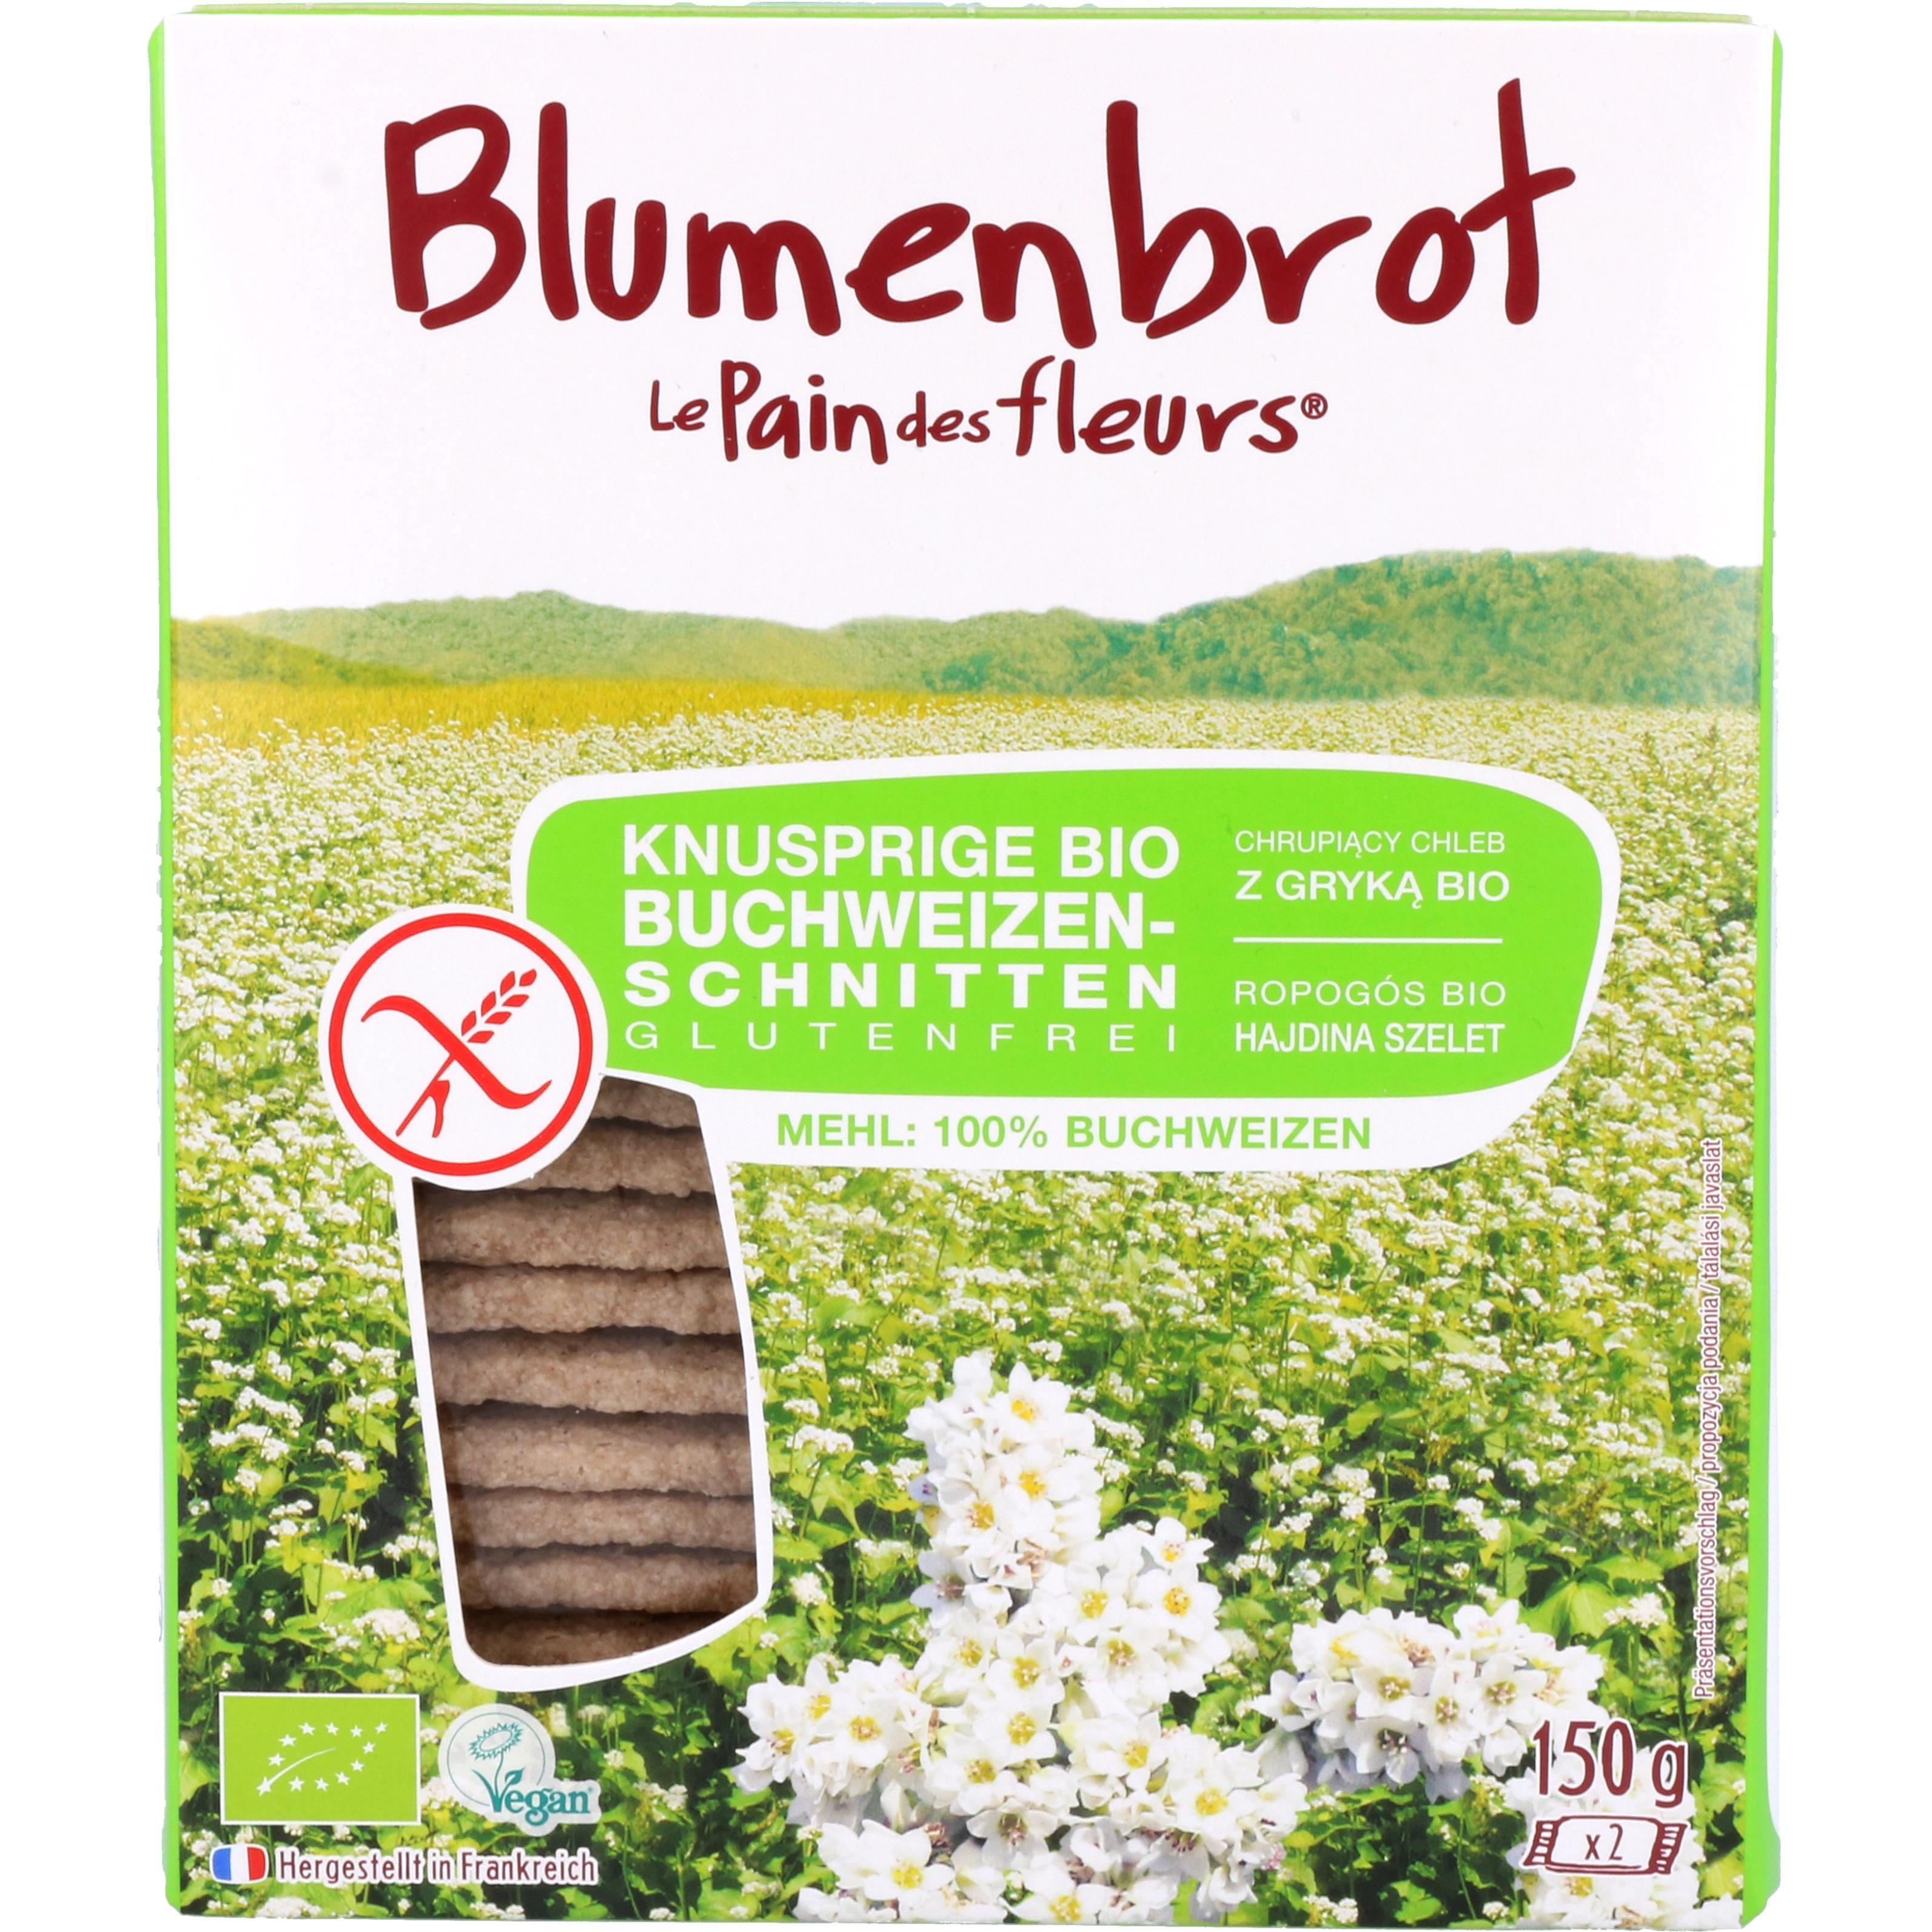 Primeal Bio Blumenbrot Buchweizen 150g